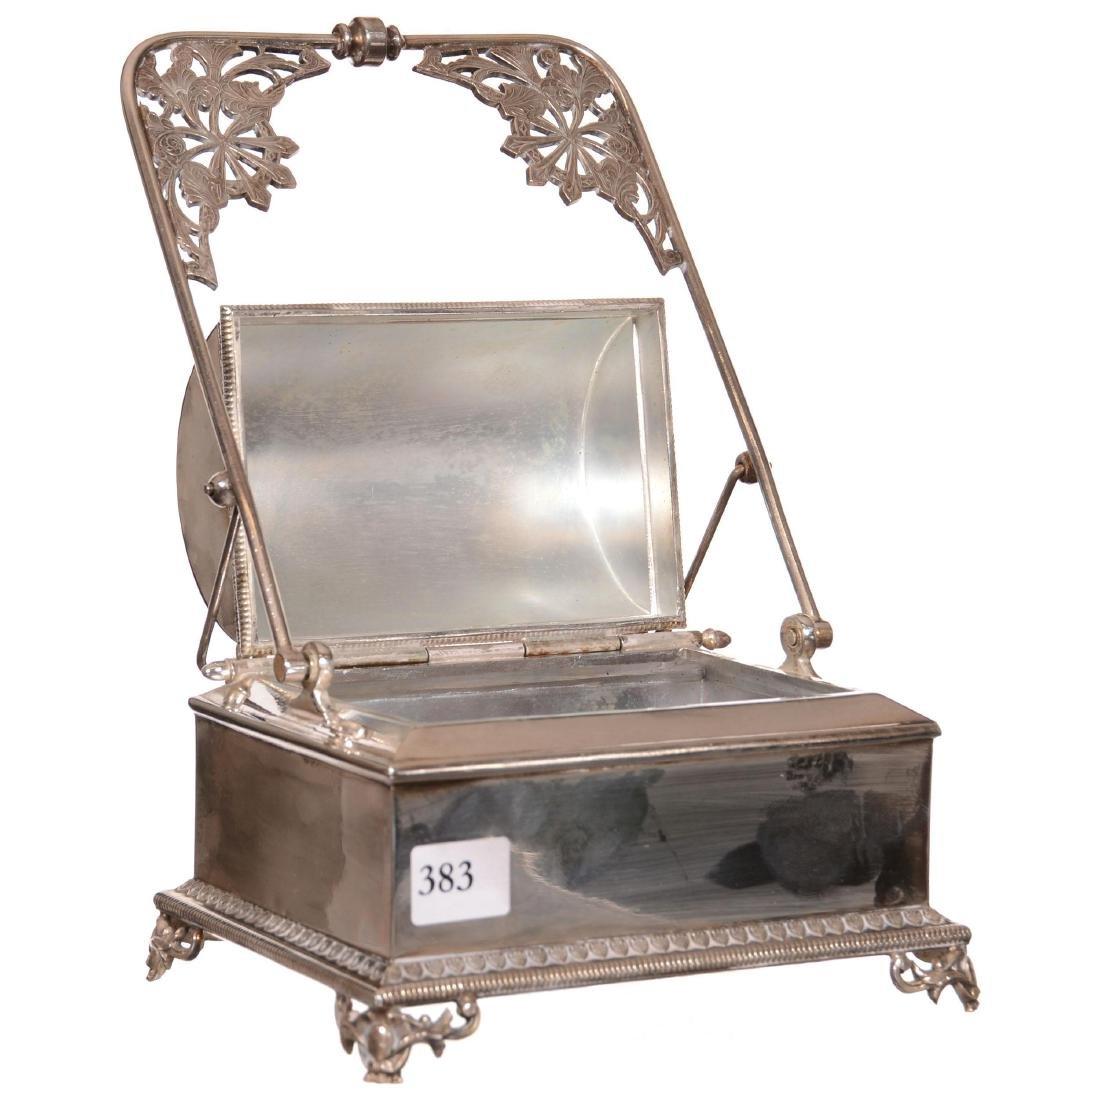 Victorian Mechanical Jewelry Casket